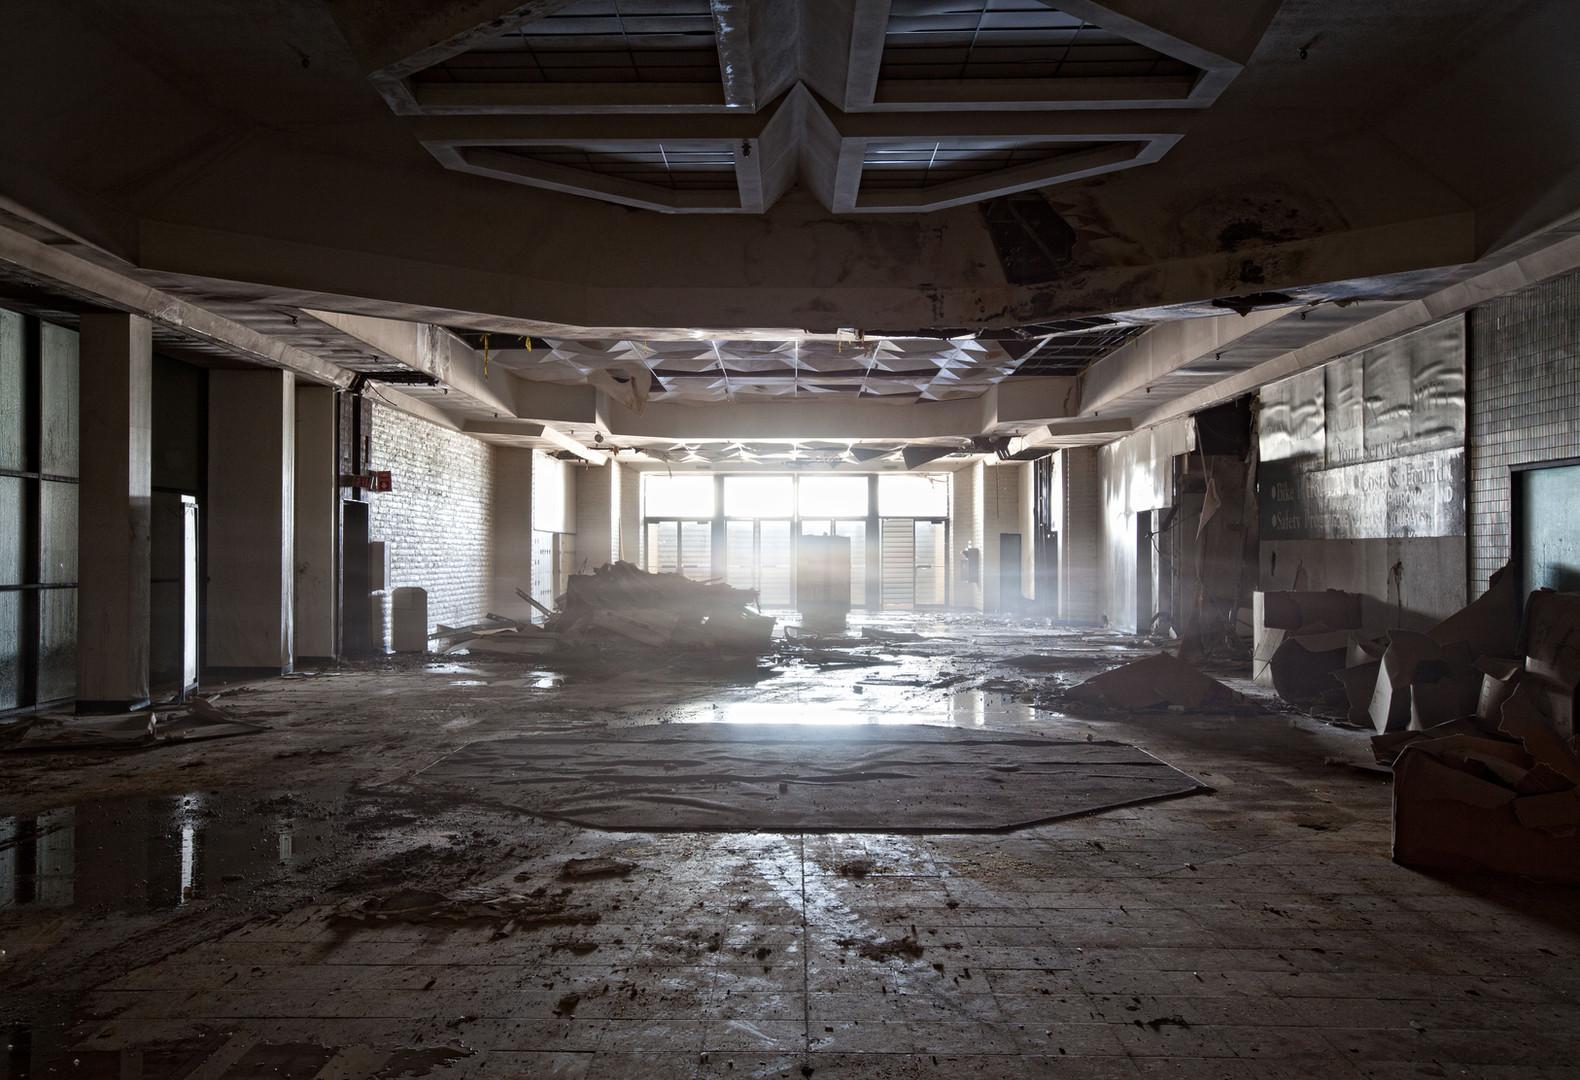 Randall Park Mall | Misty Entrance